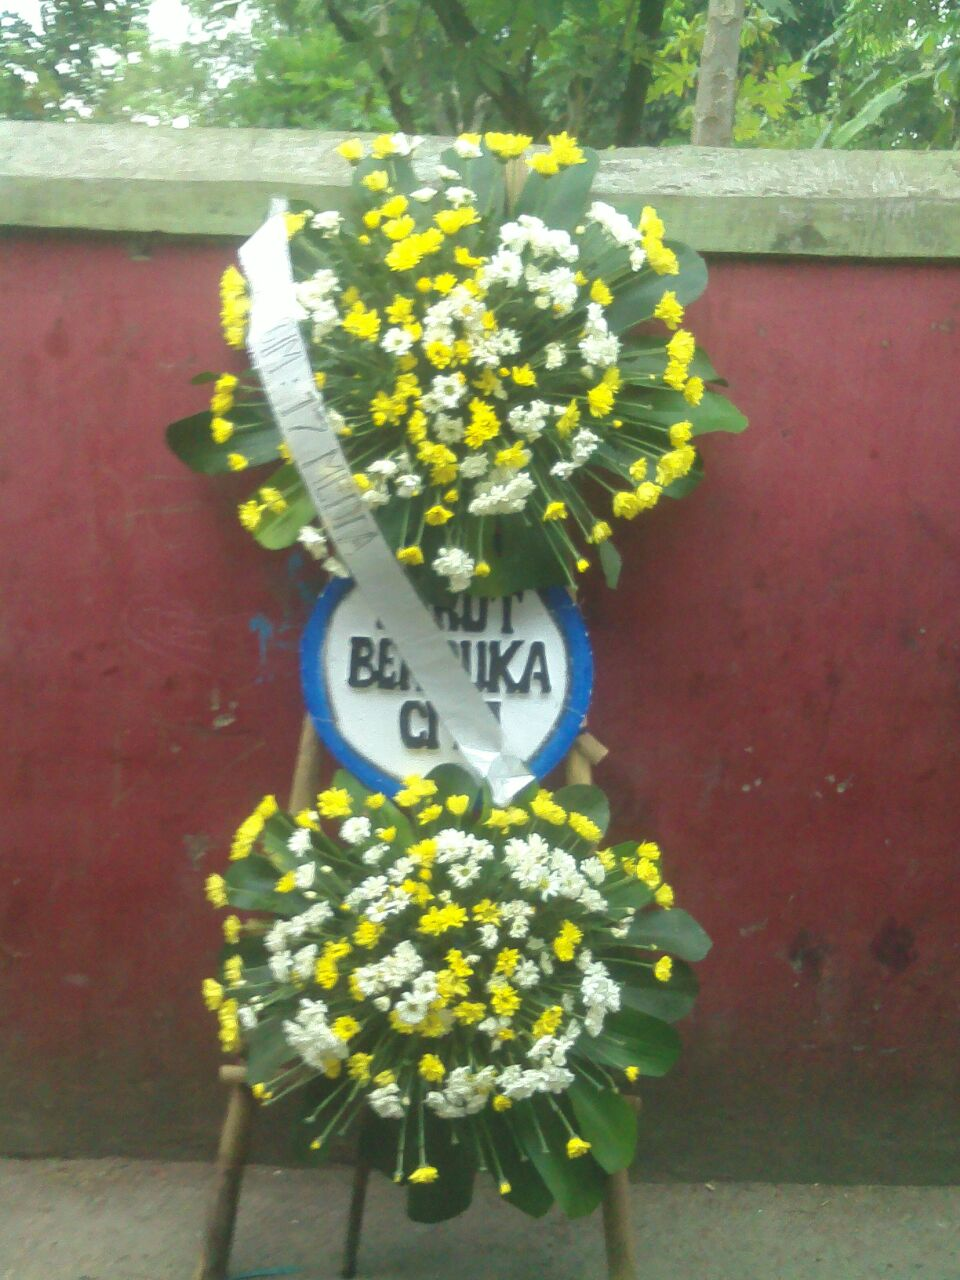 Toko Bunga Meysa Aneka Bunga Segar Di Subang Papan Bunga